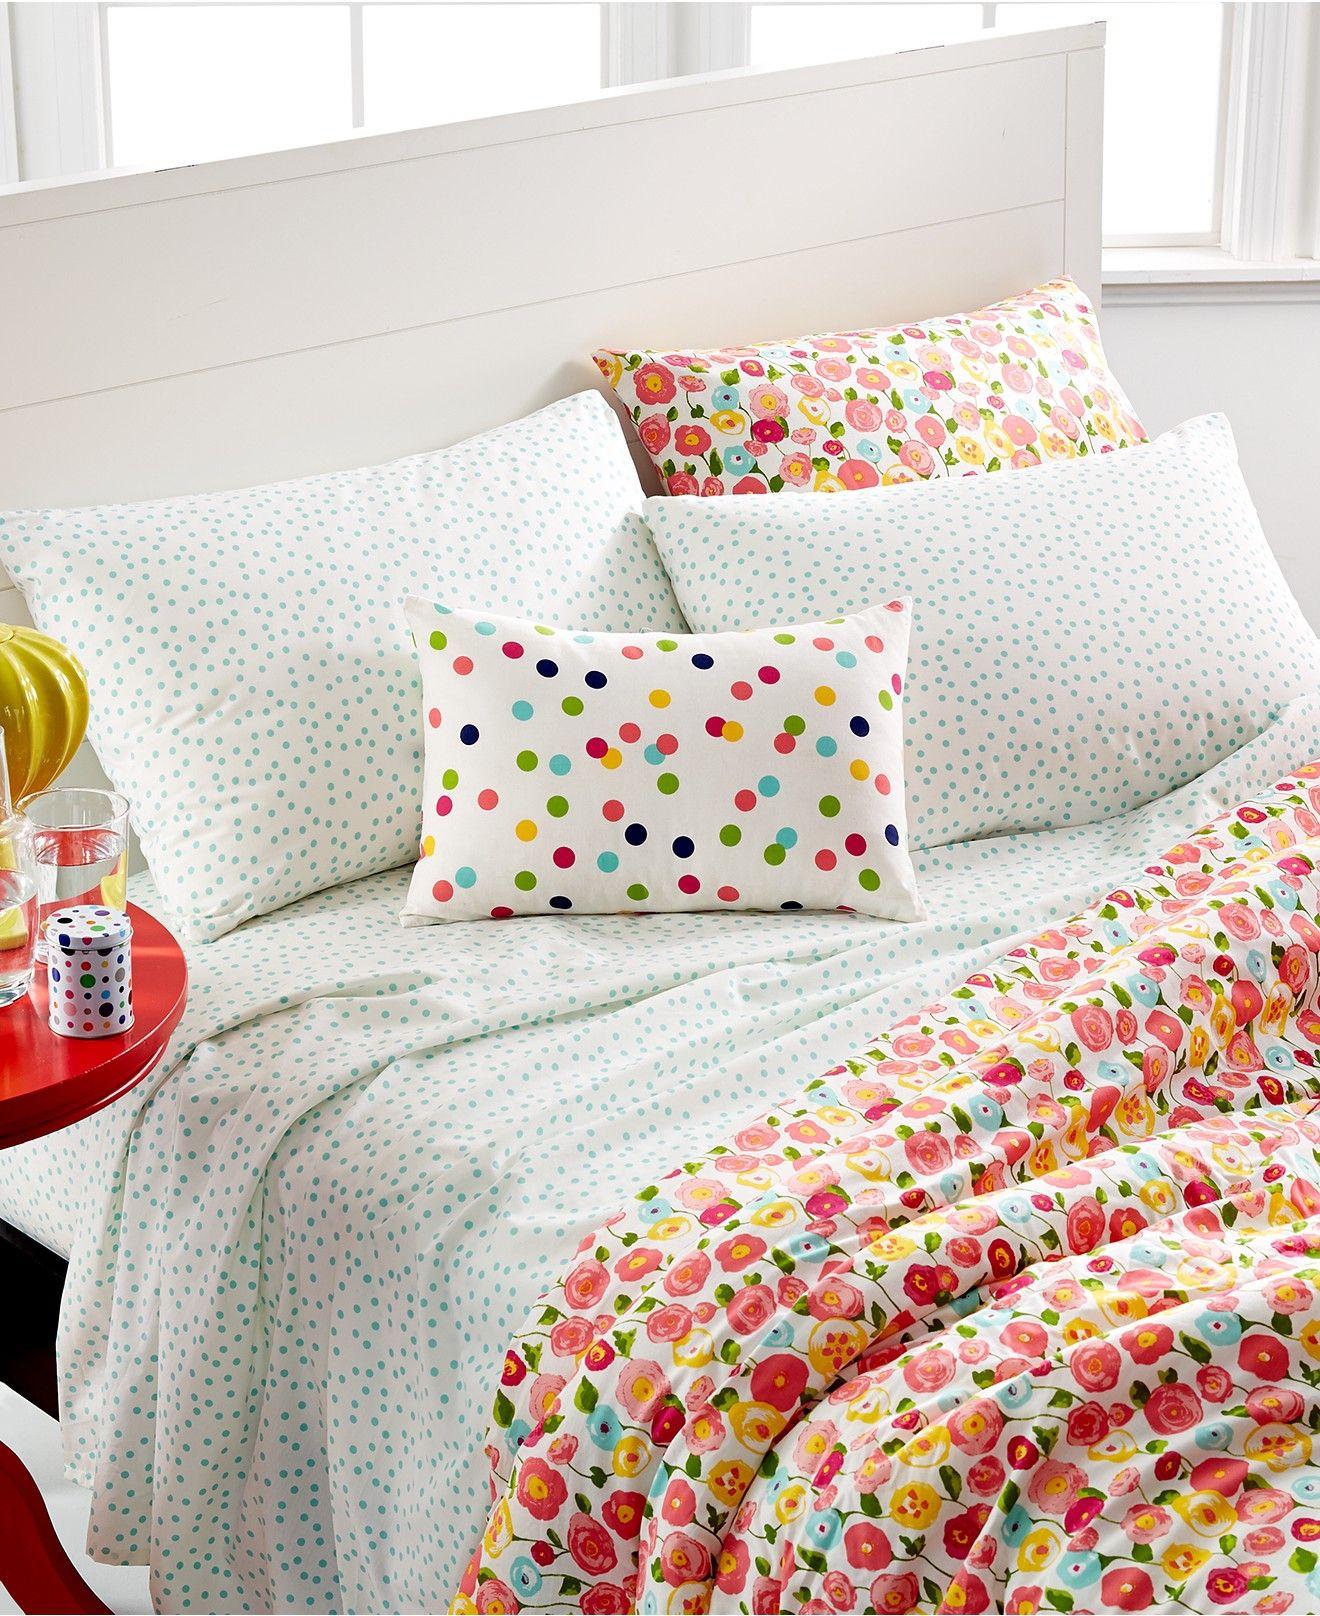 Hoxton Bedding Set BHS Soft bath towels, Bedding set